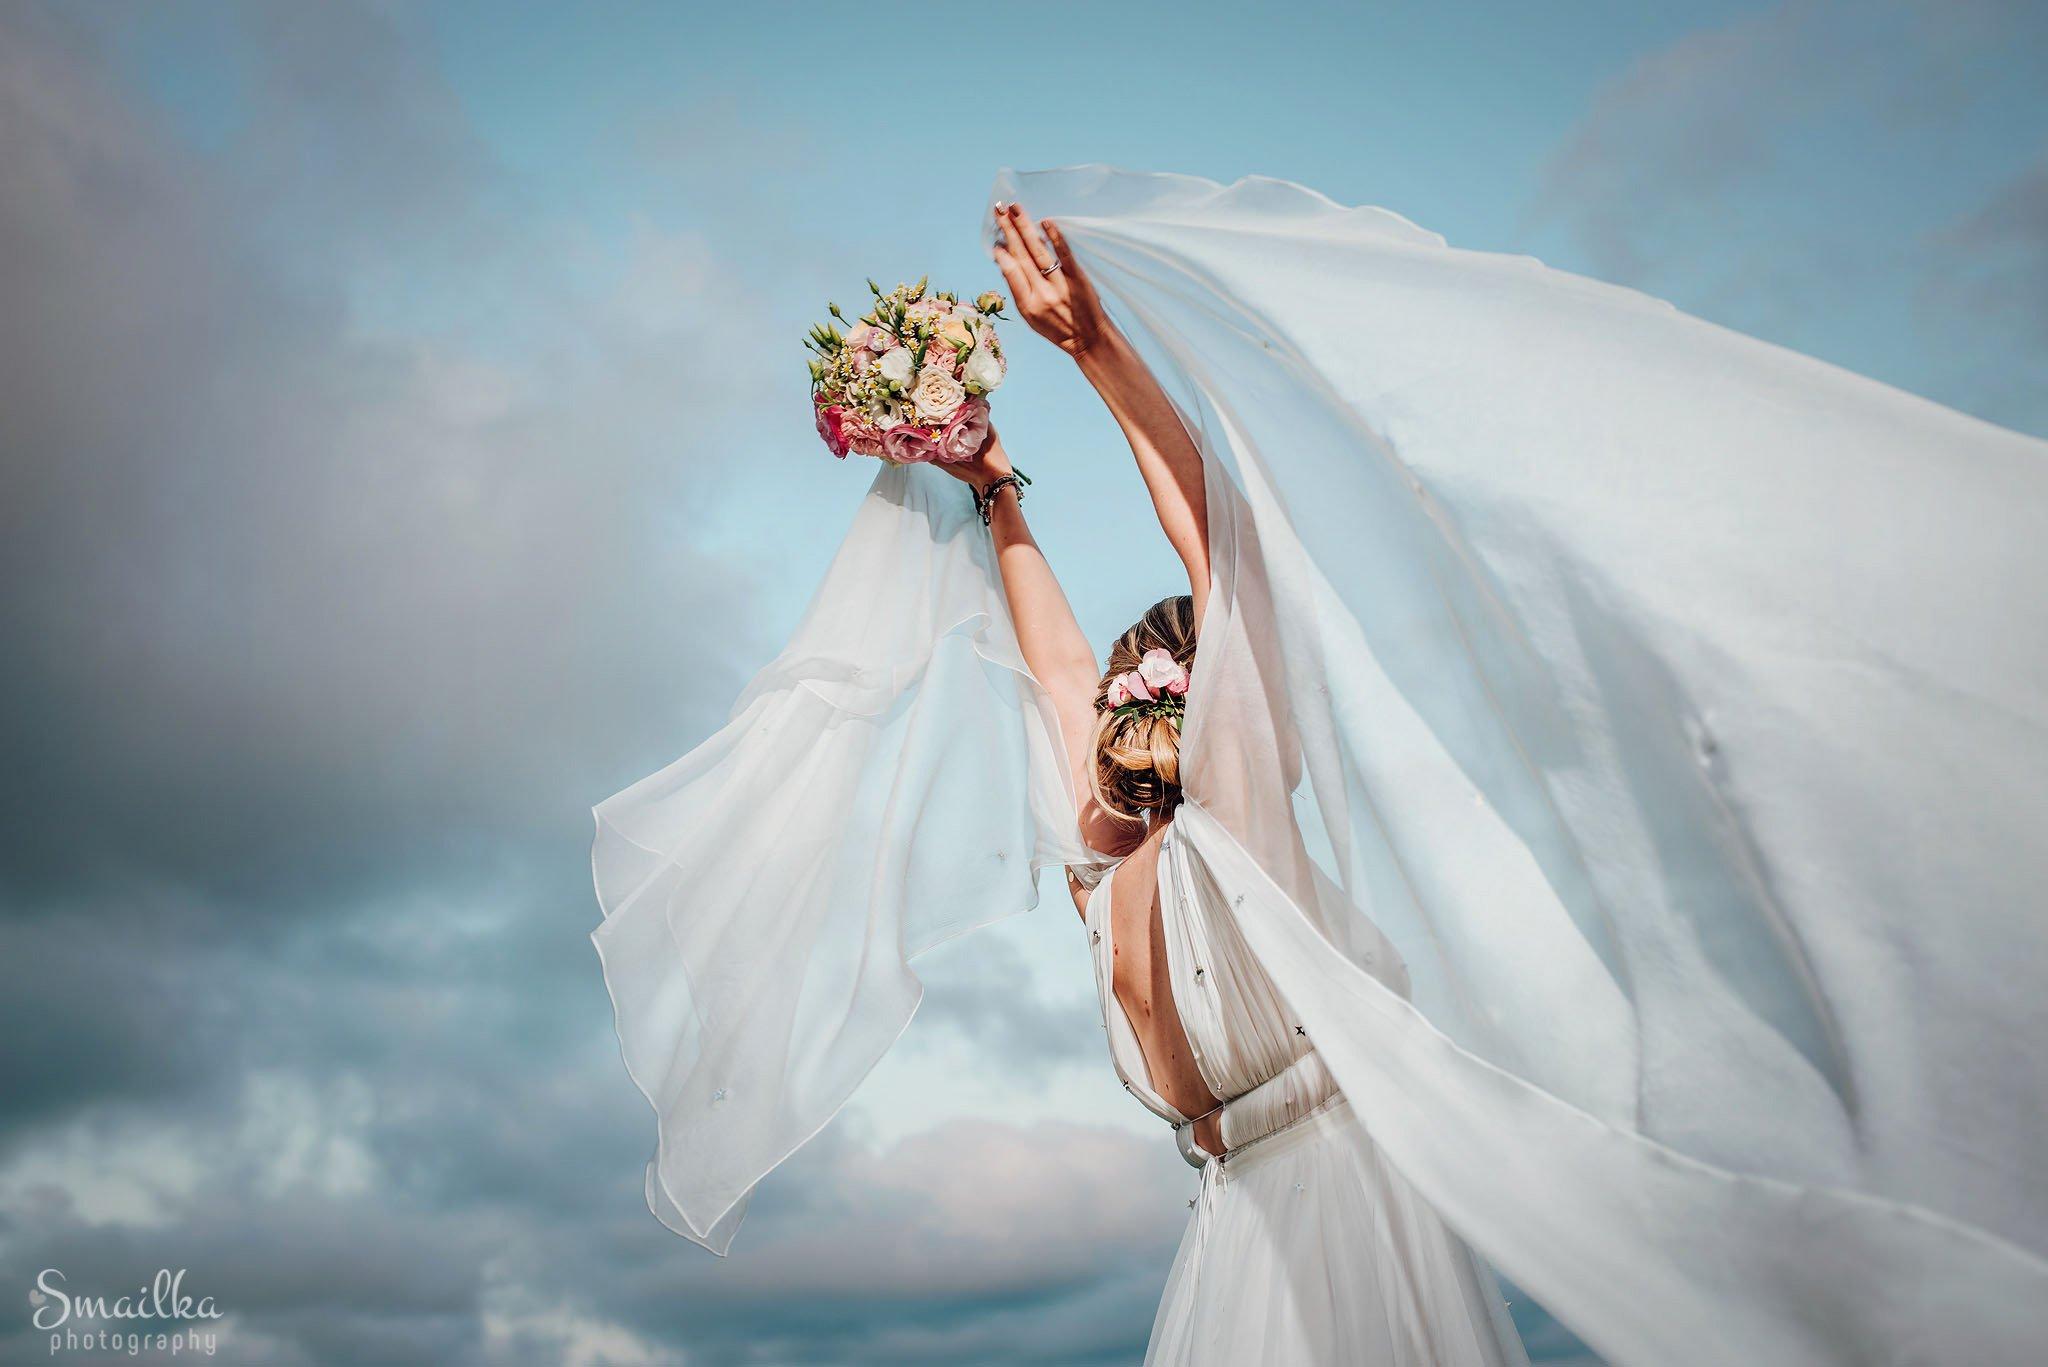 Bridal veil, bouquet, wedding dress